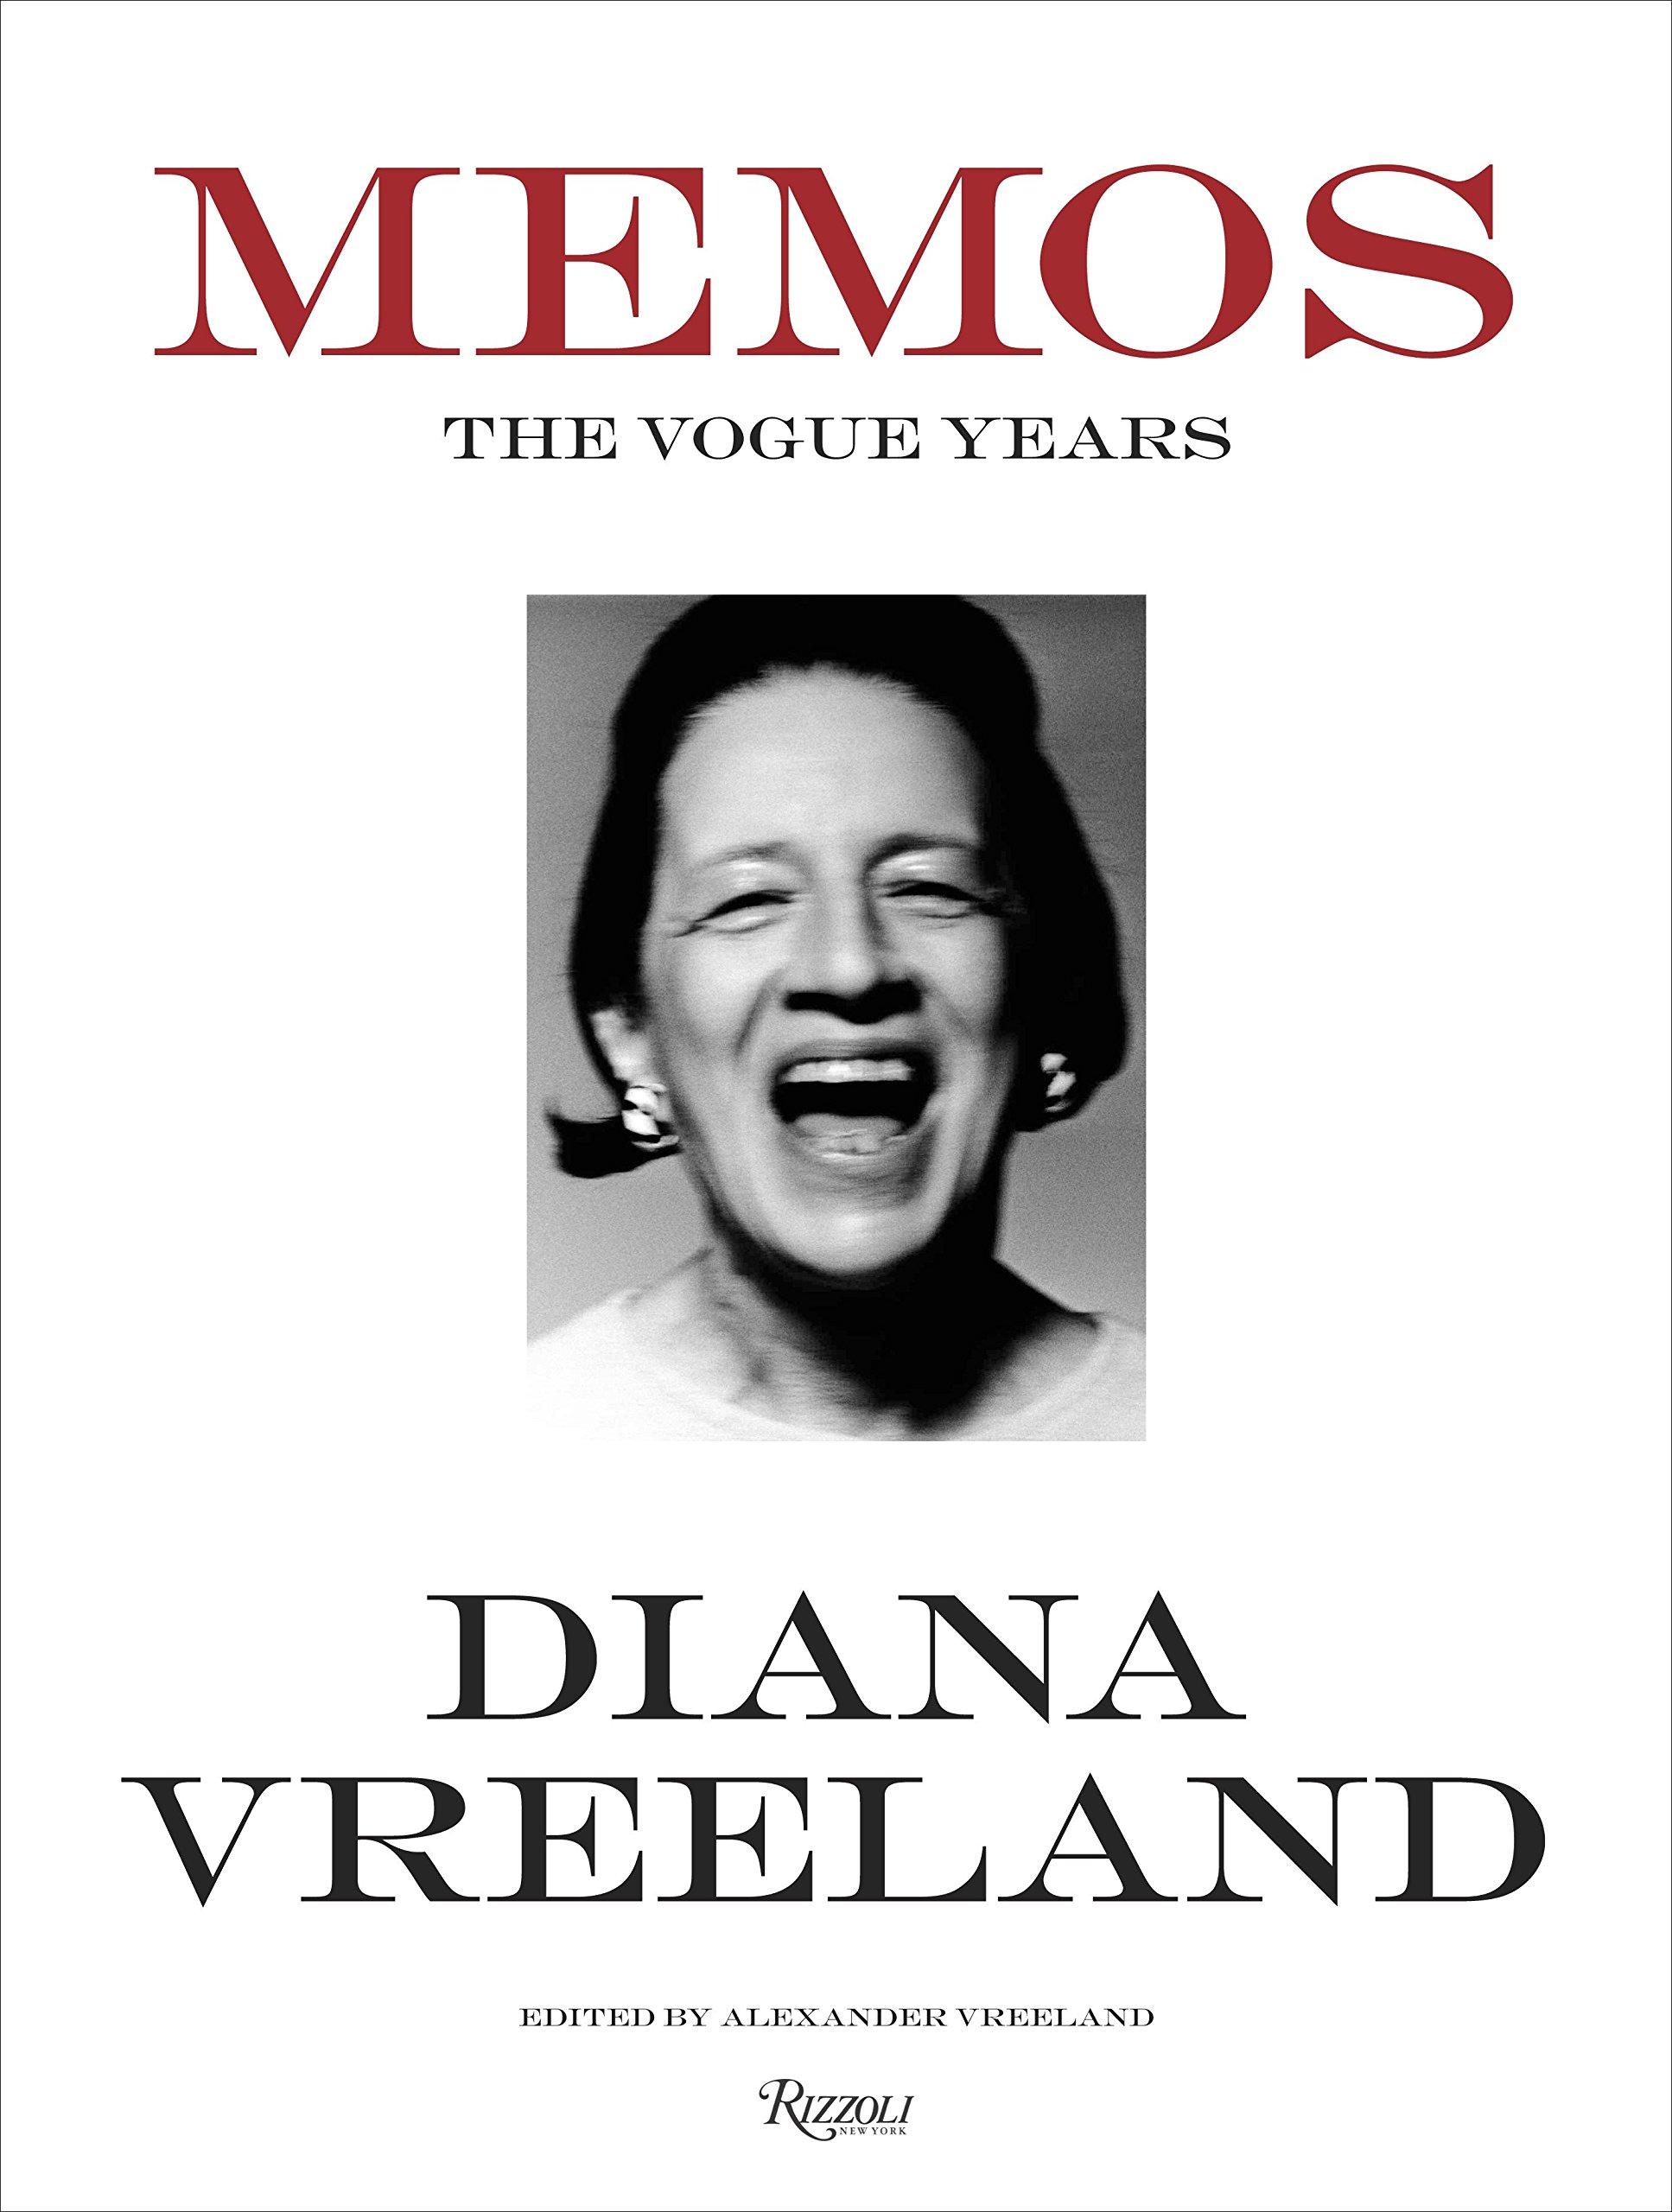 Memos from Diana Vreeland: Correspondence from the Vogue Years: Amazon.es: Vreeland, Alexander: Libros en idiomas extranjeros